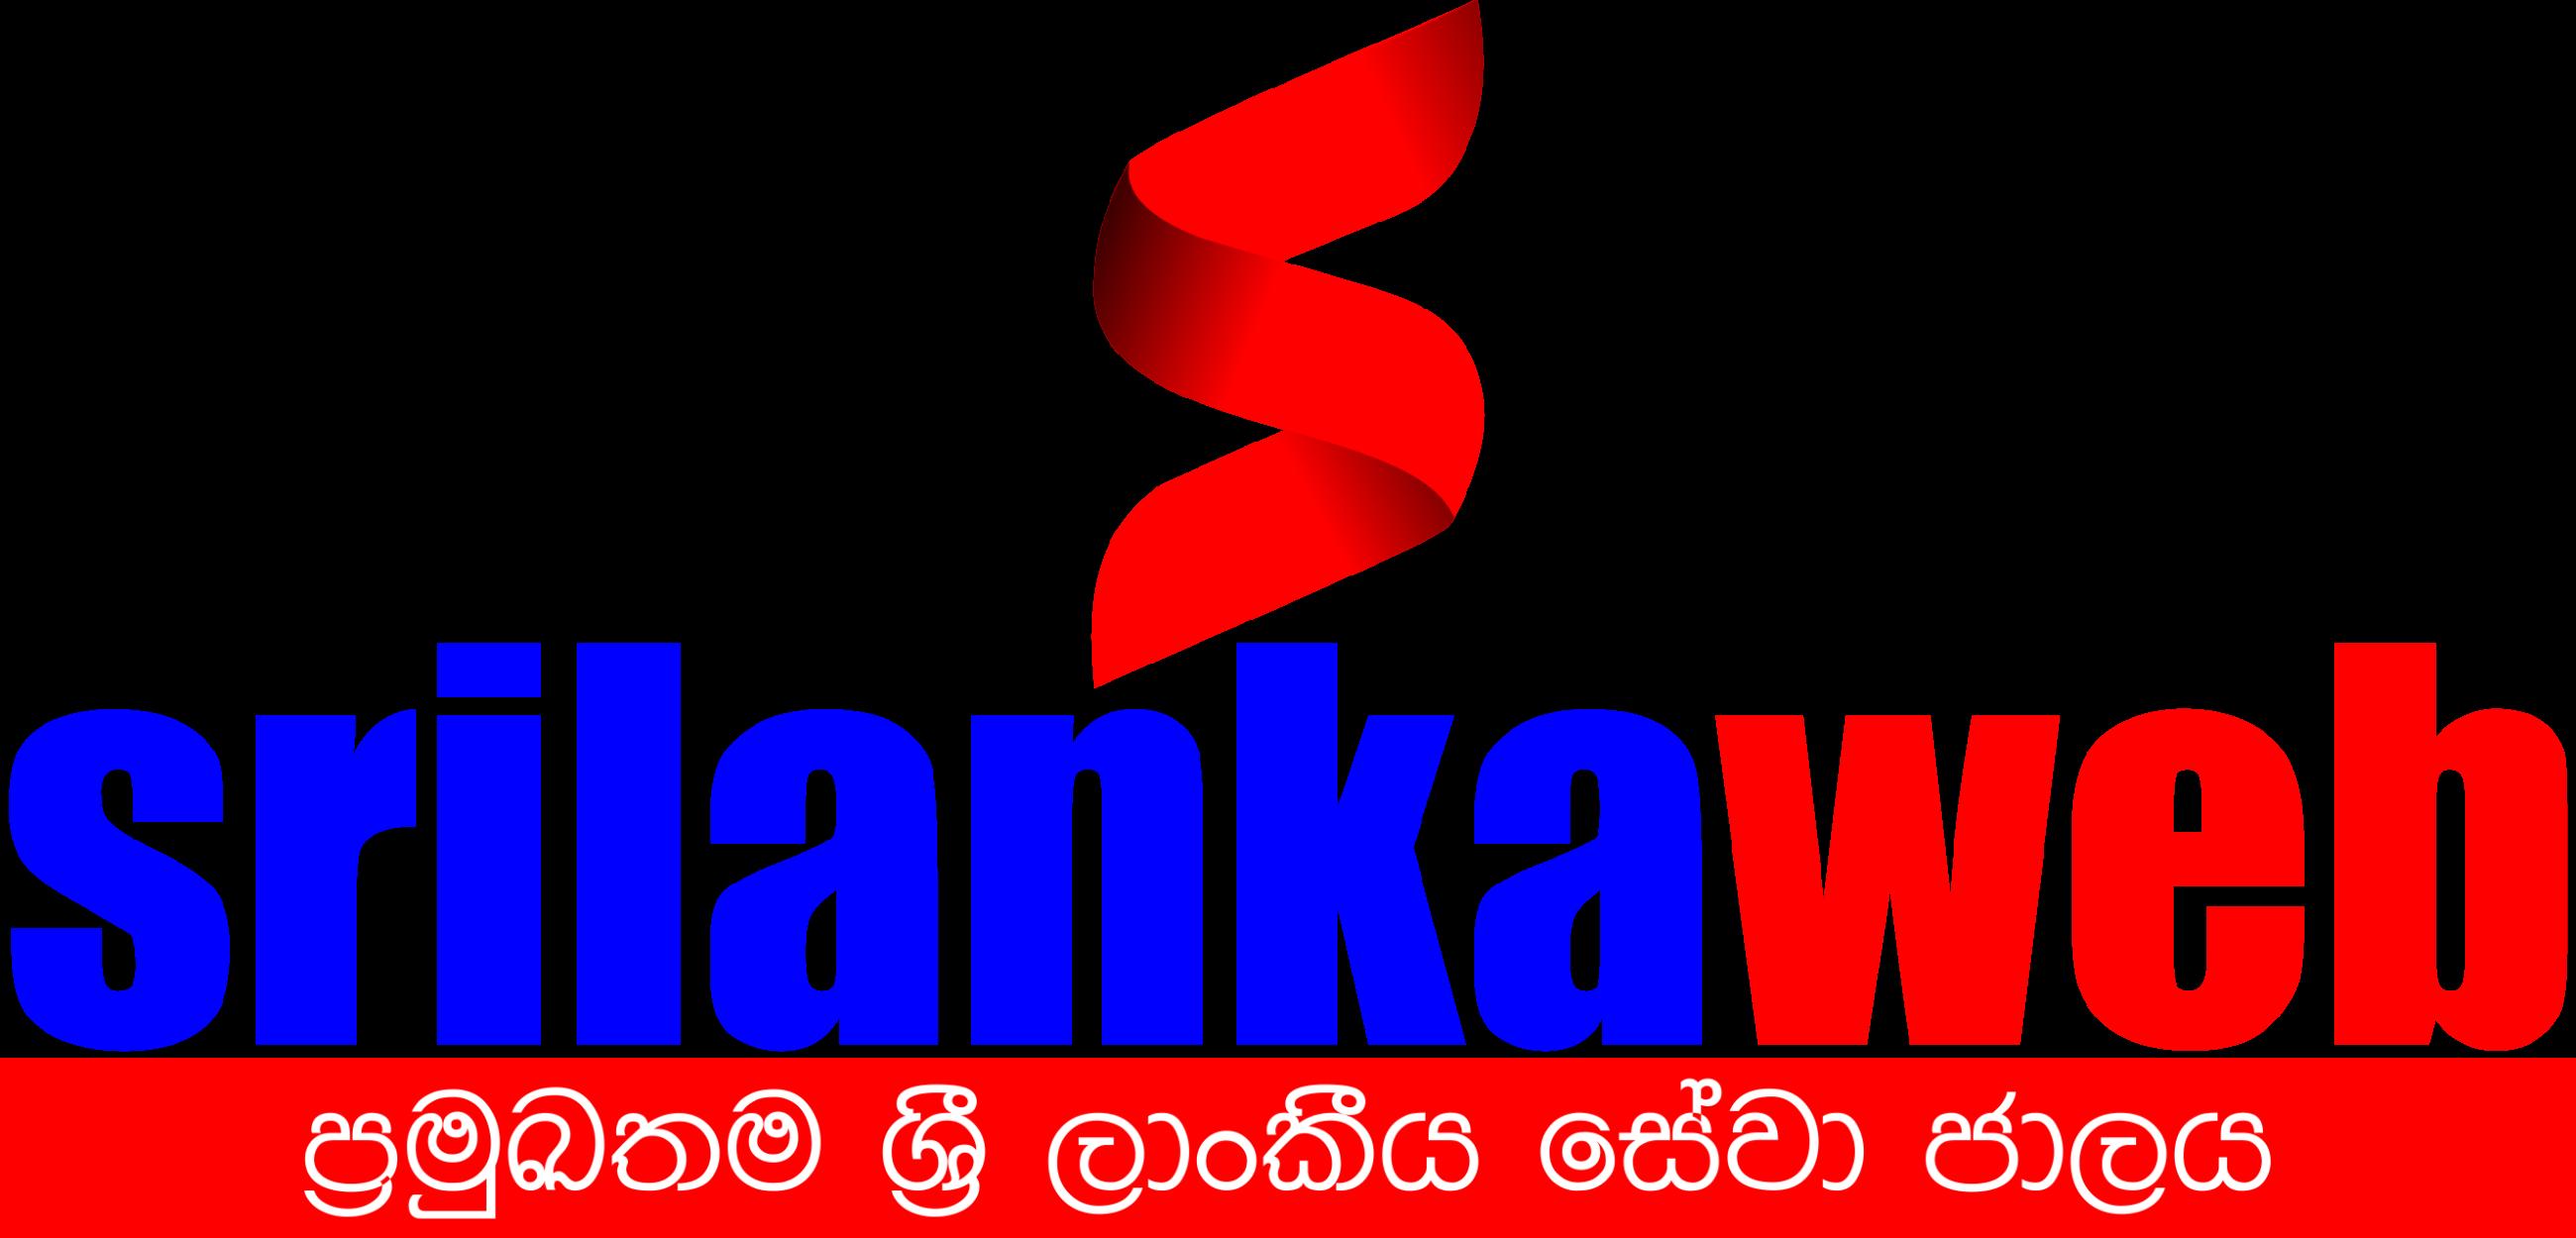 srilankaweb - pronto pse